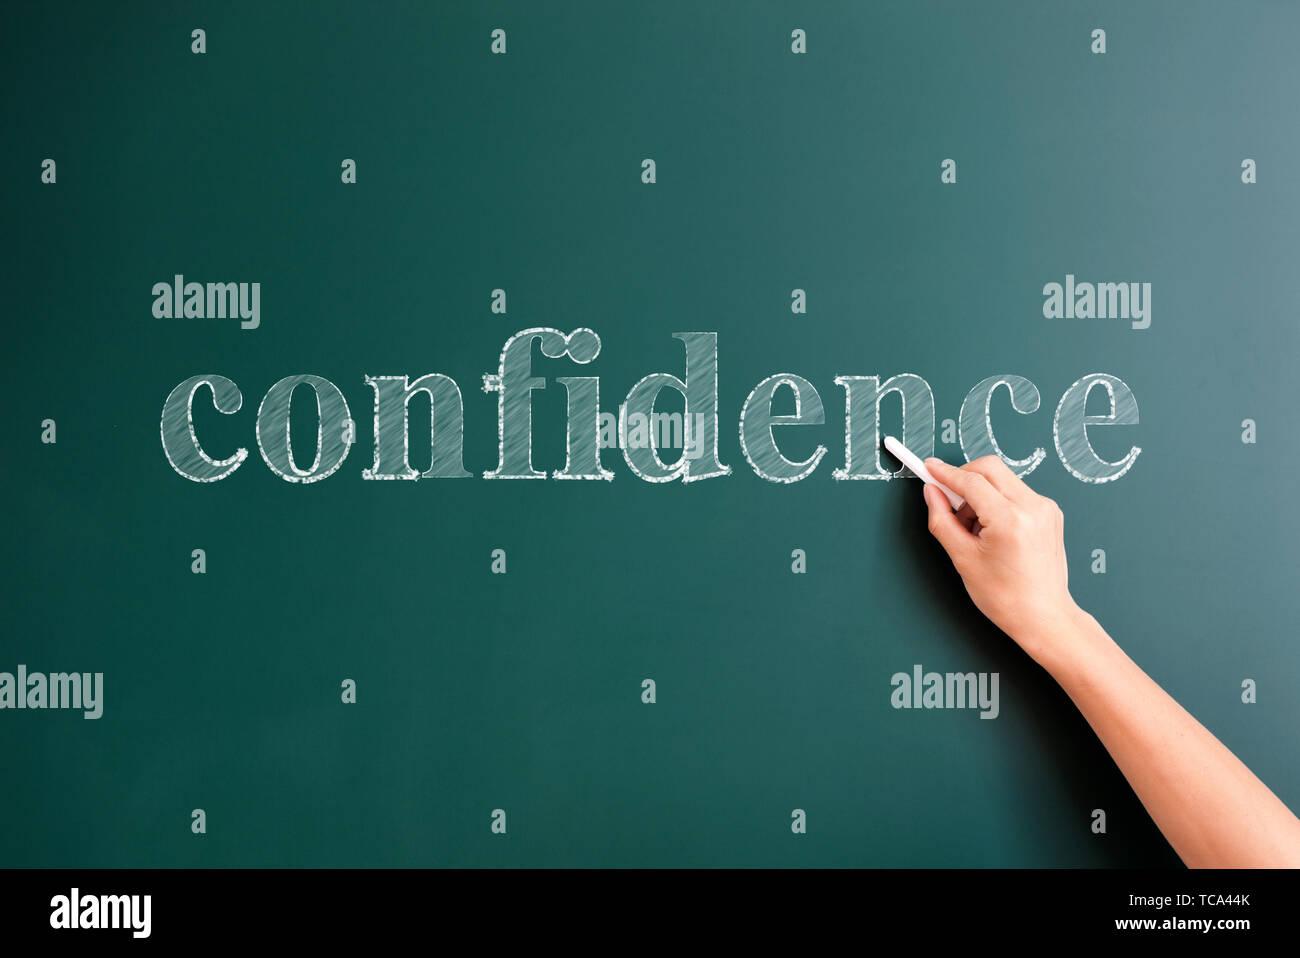 confidence written on blackboard - Stock Image